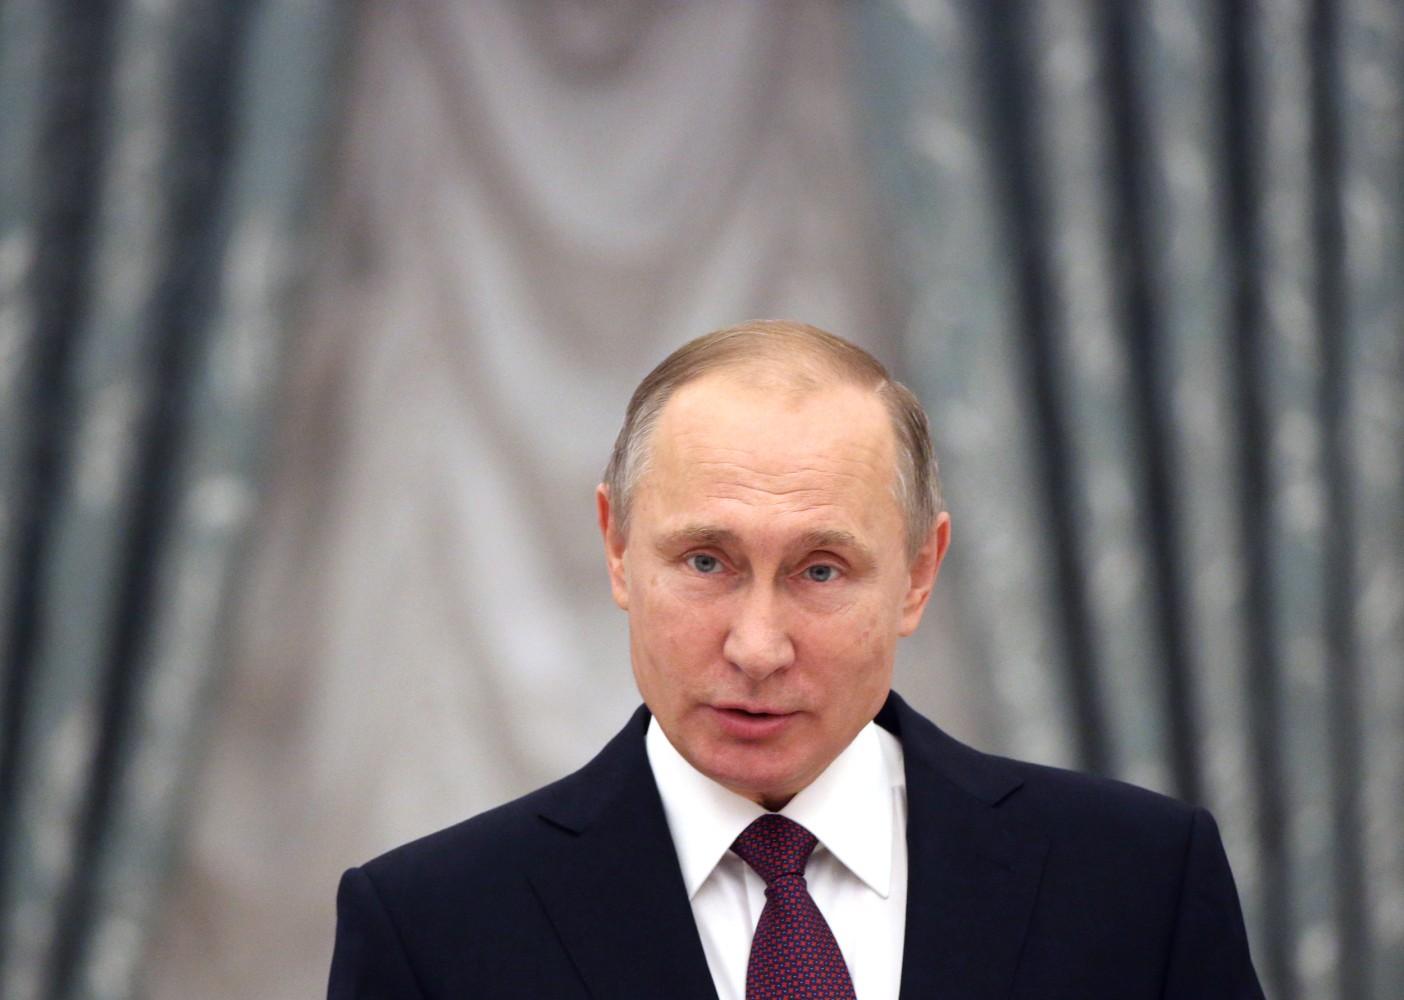 ... Putin Poses Challenge to Donald Trump Administration - NBC News